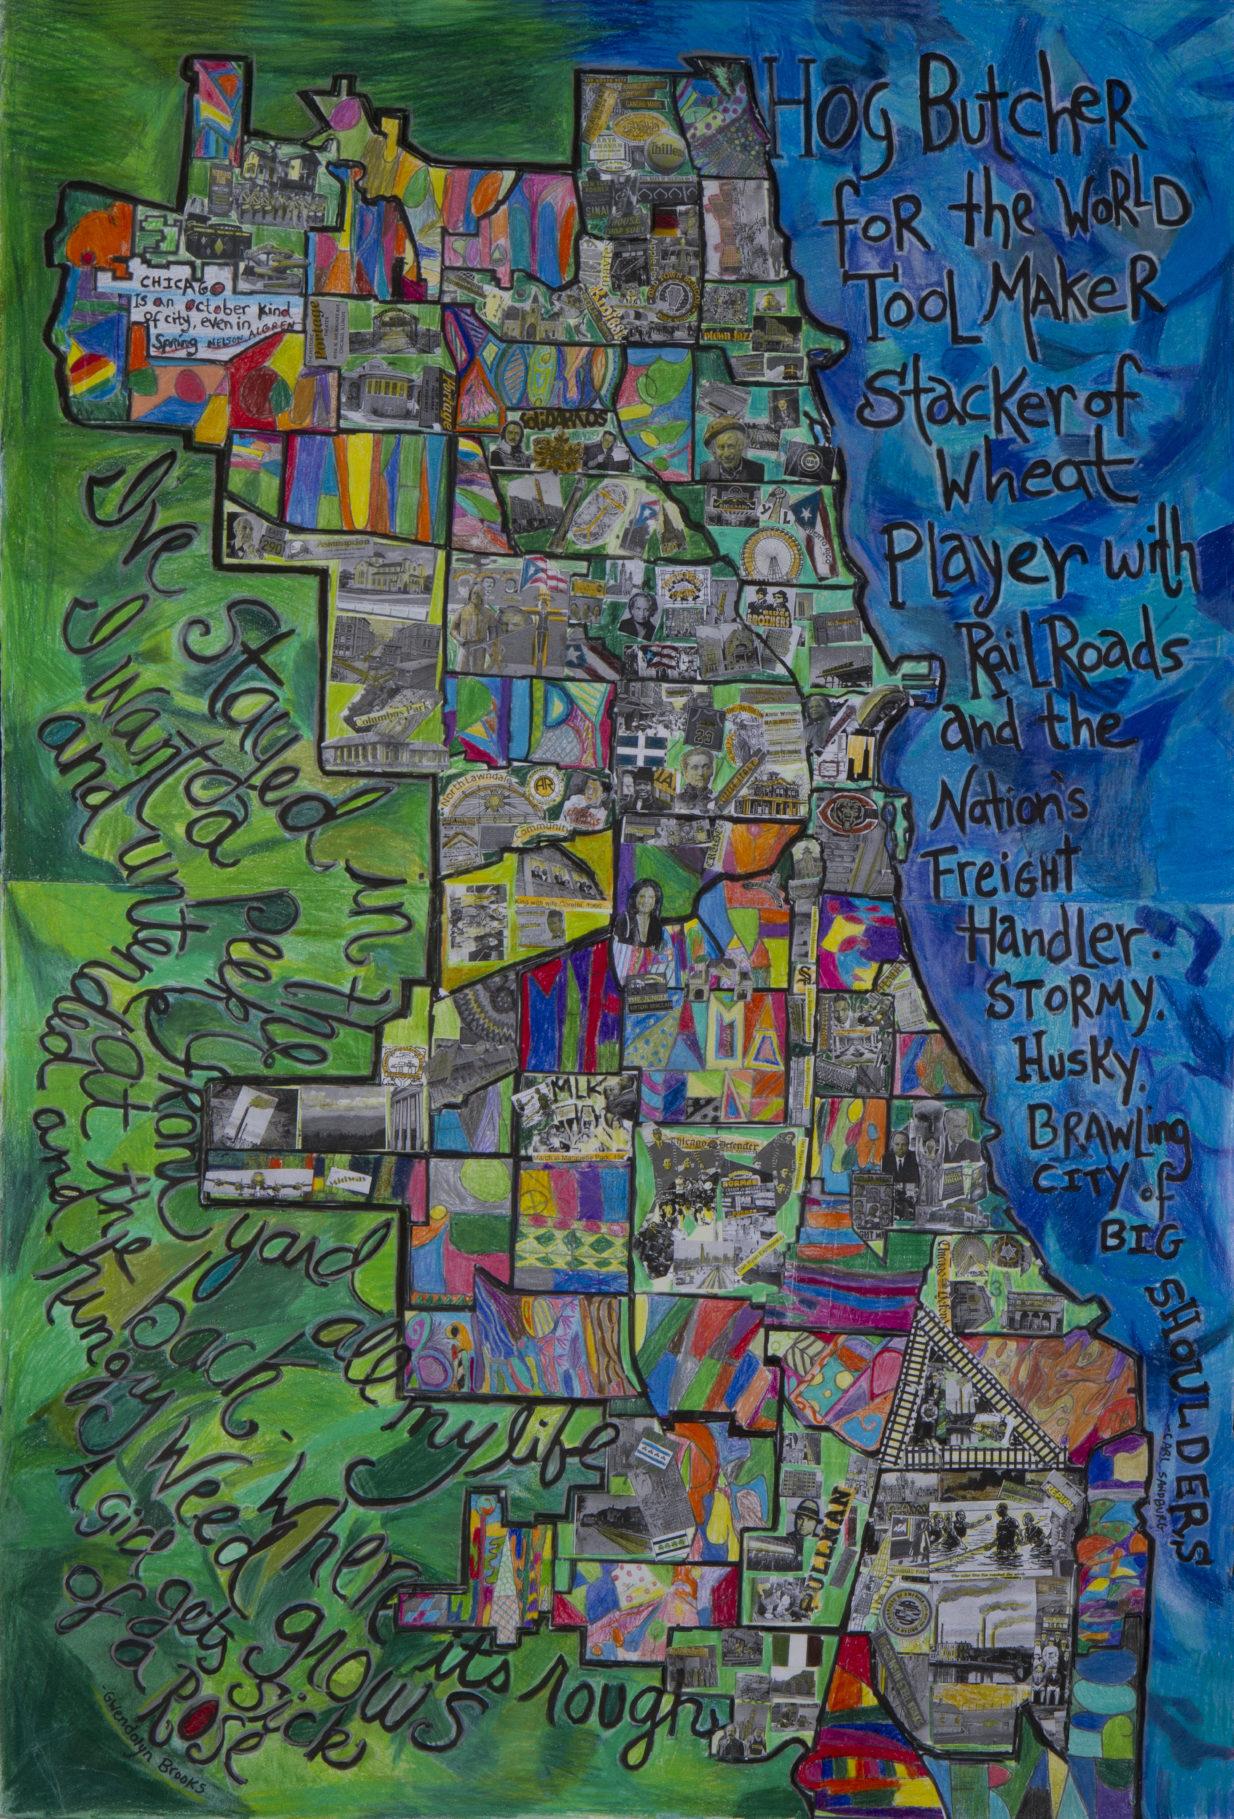 EVERY CHICAGO NEIGHBORHOOD HAS A STORY